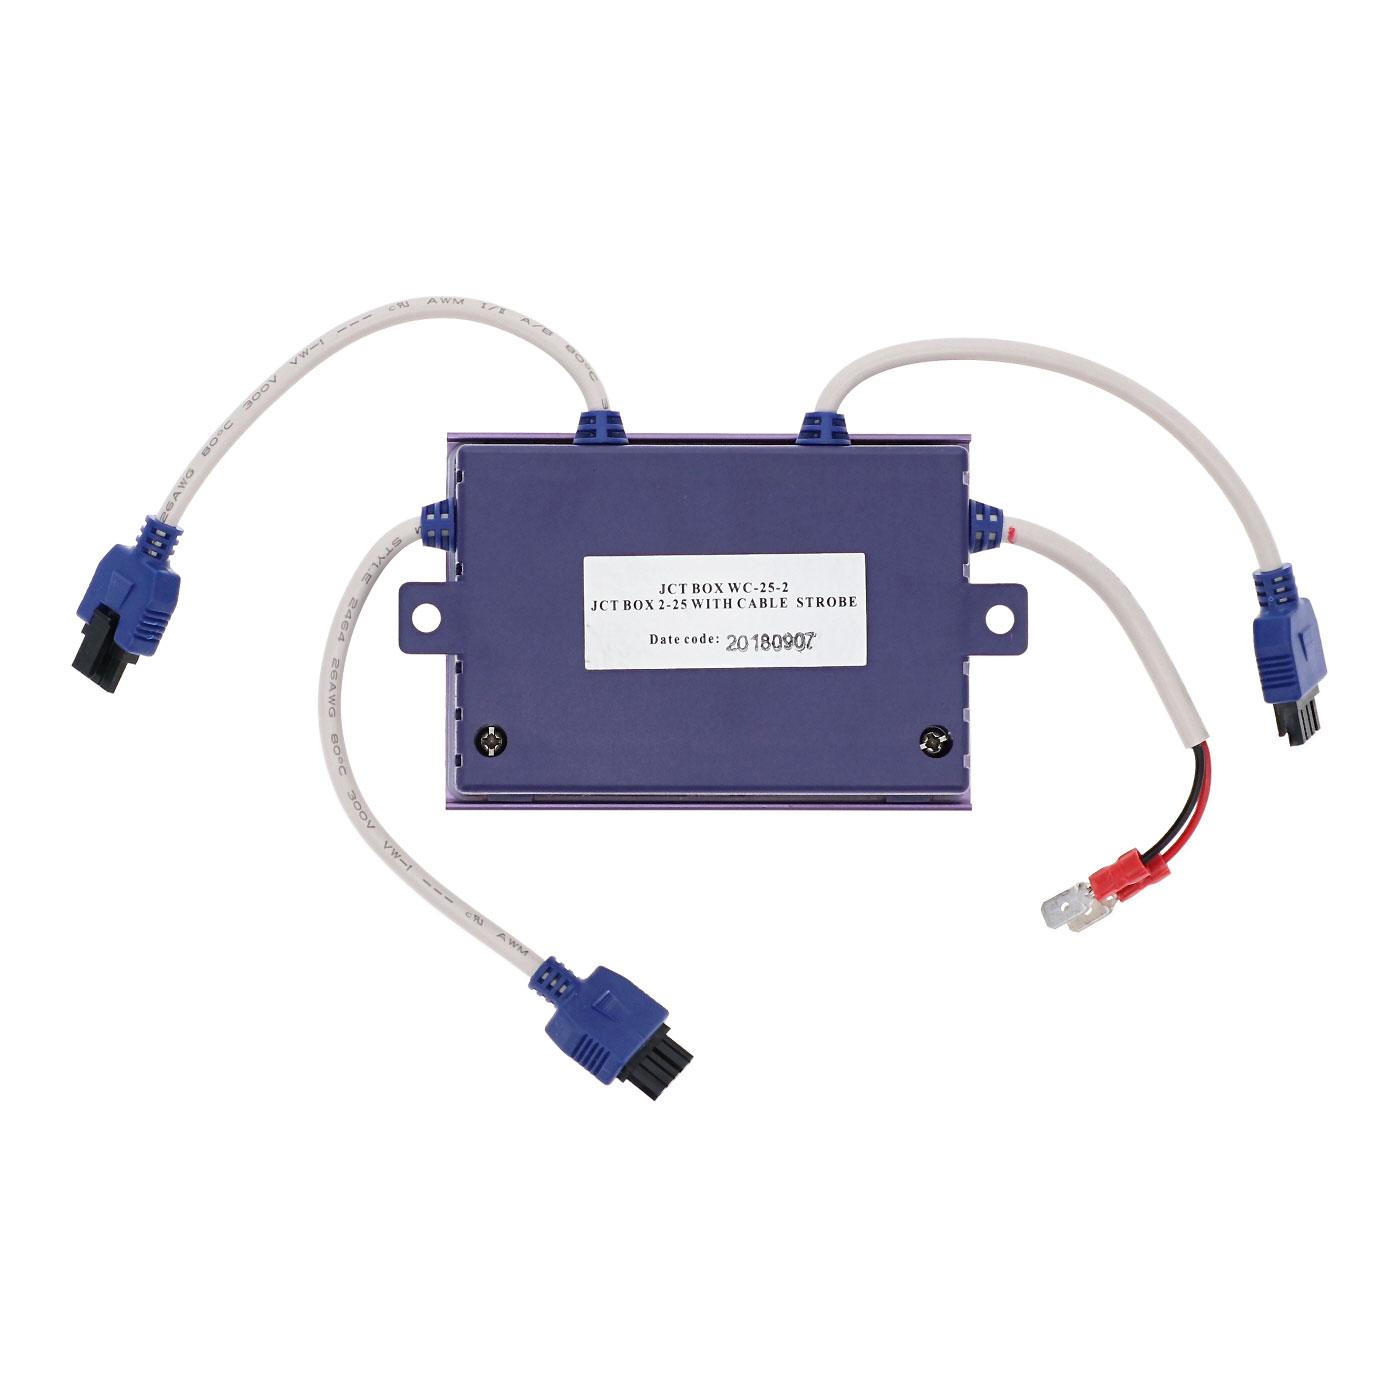 5-50-2D LED Connector Box